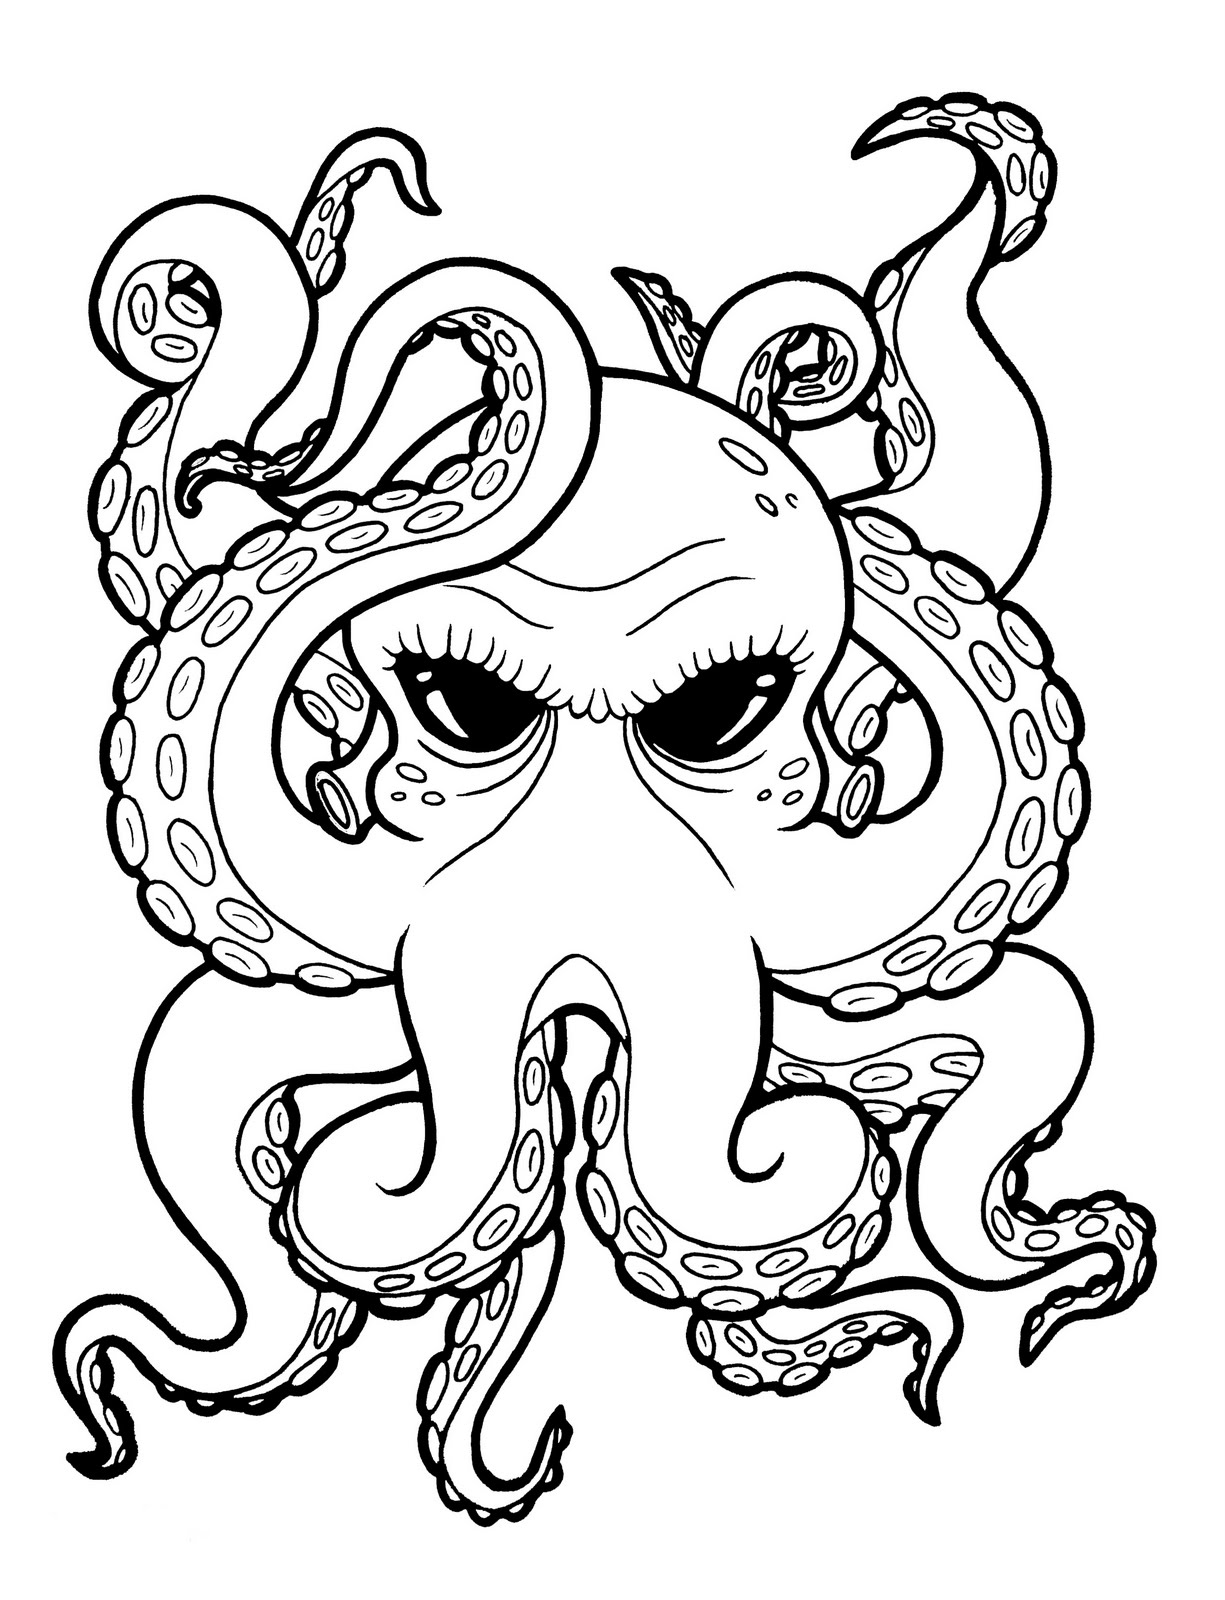 1225x1600 Cartoon Octopus Drawing Tattoos Tattoo, Drawings